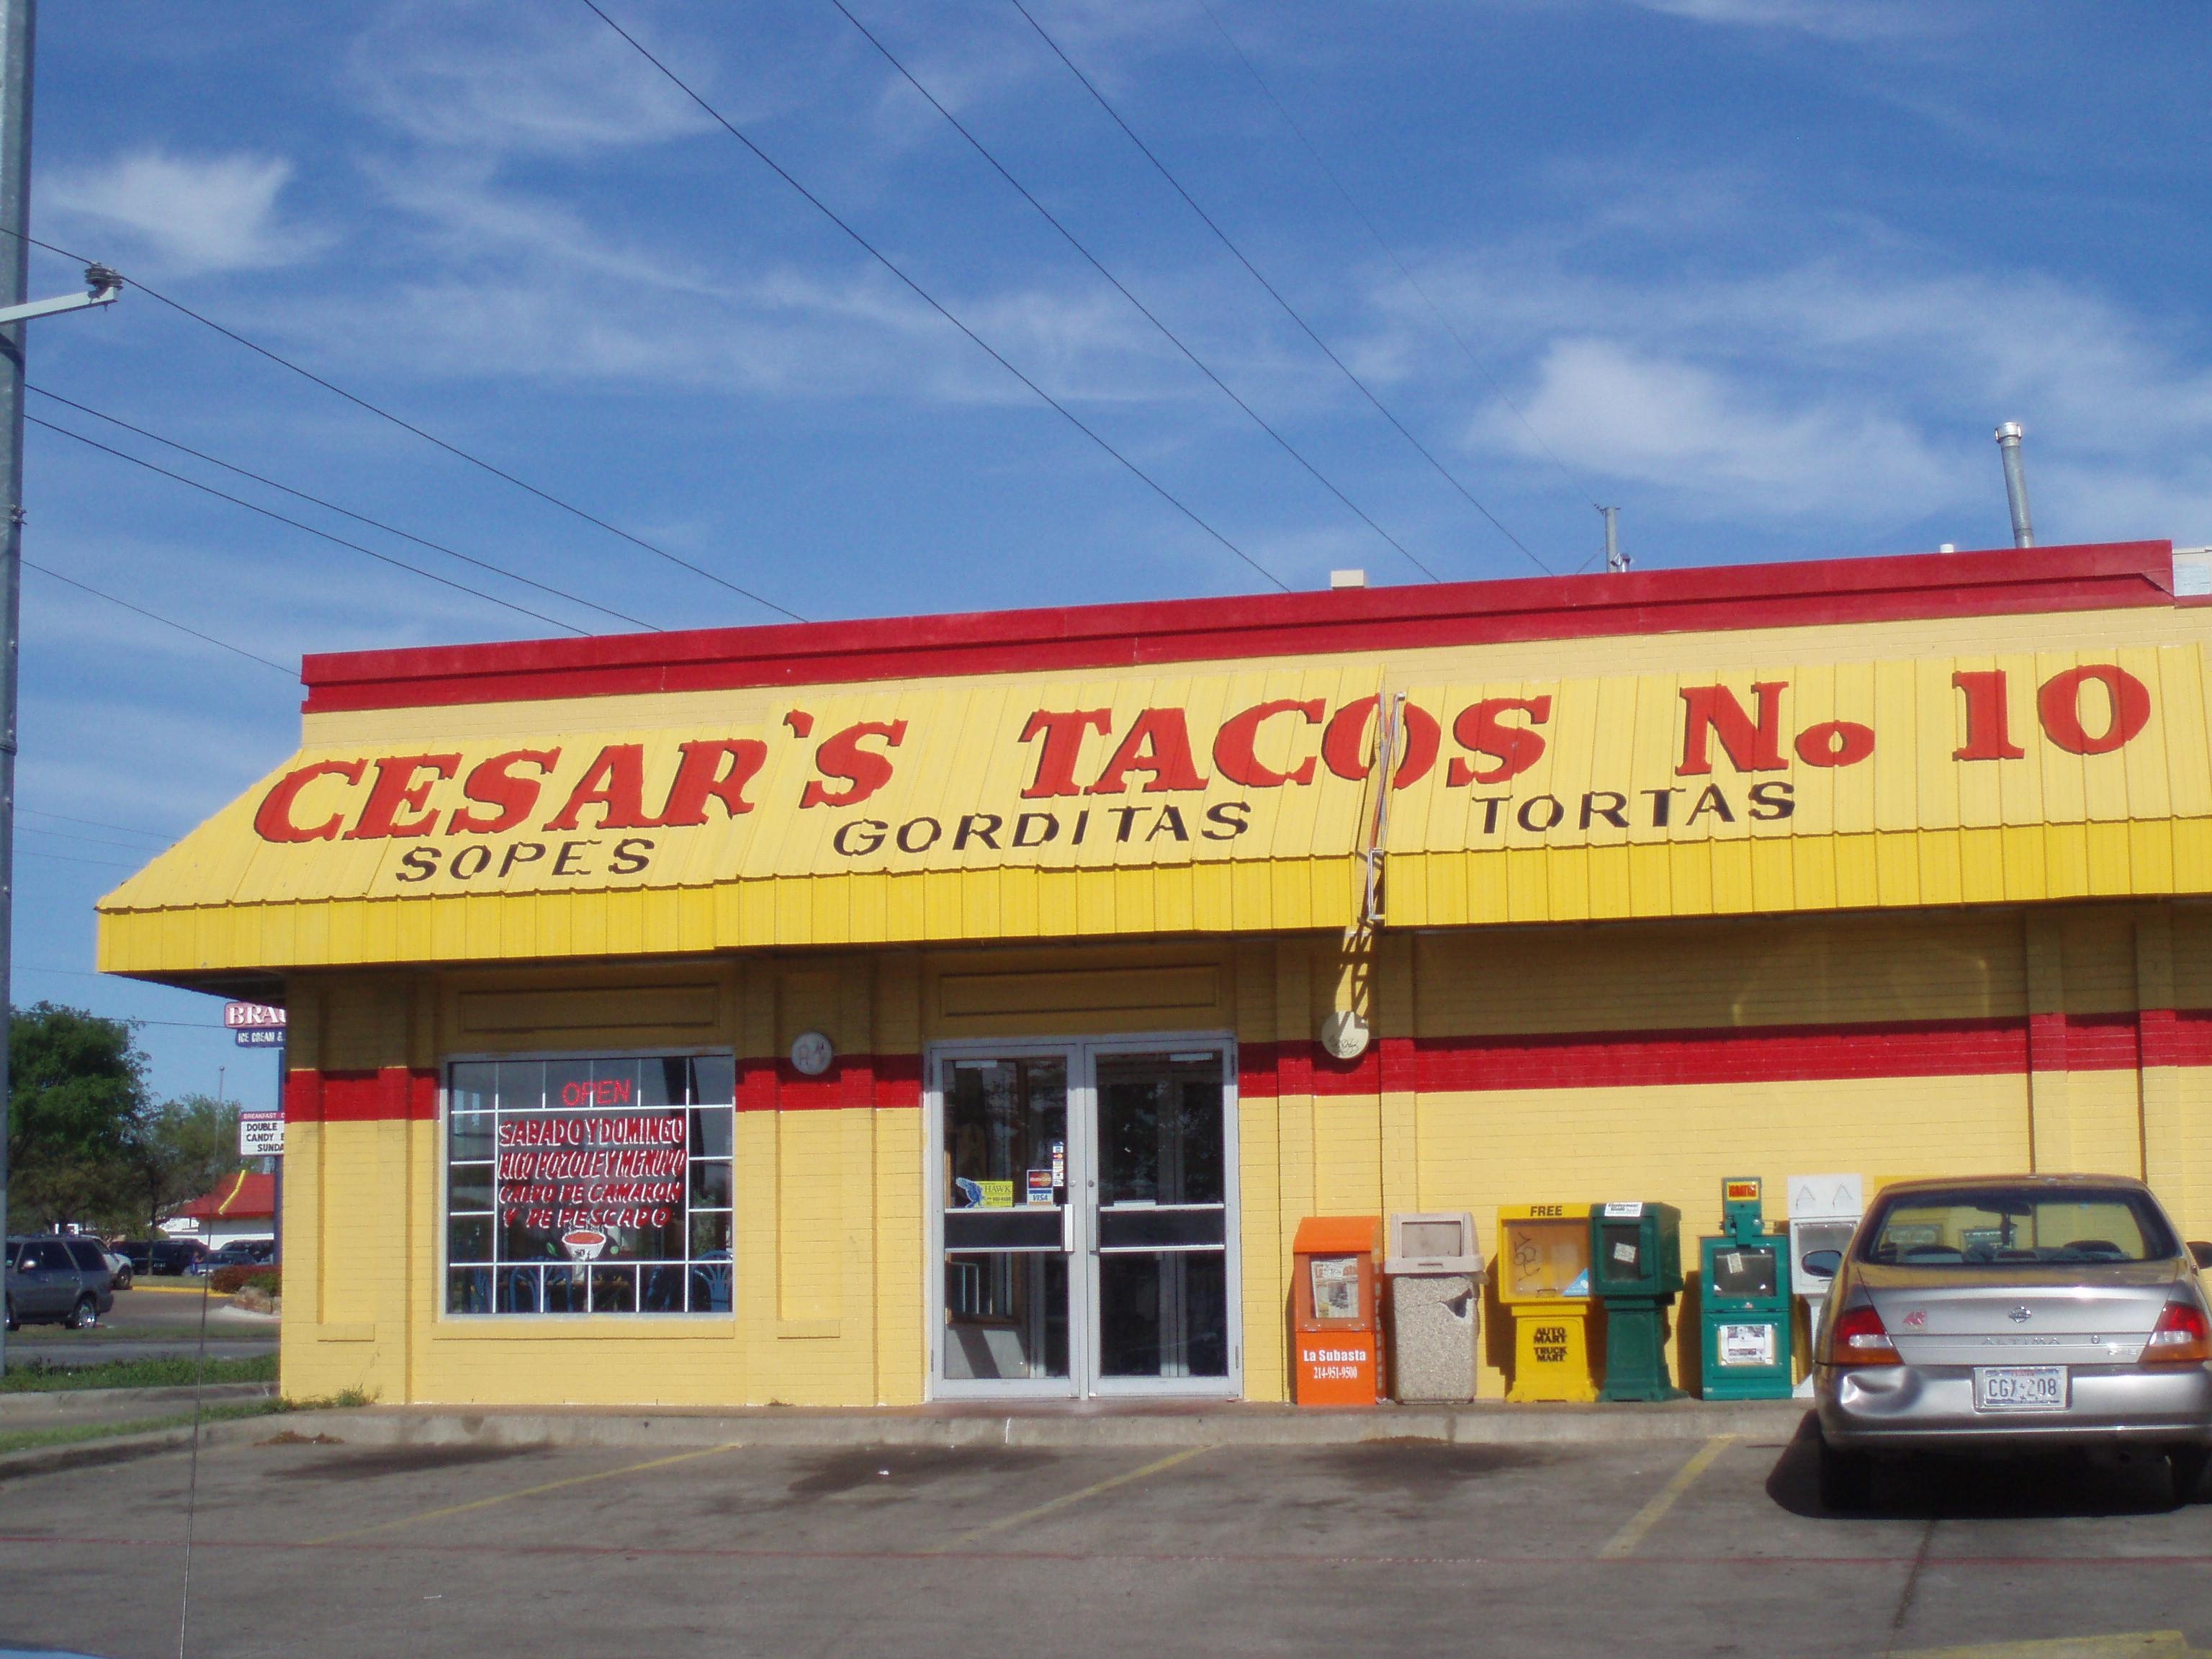 Cesar's Tacos